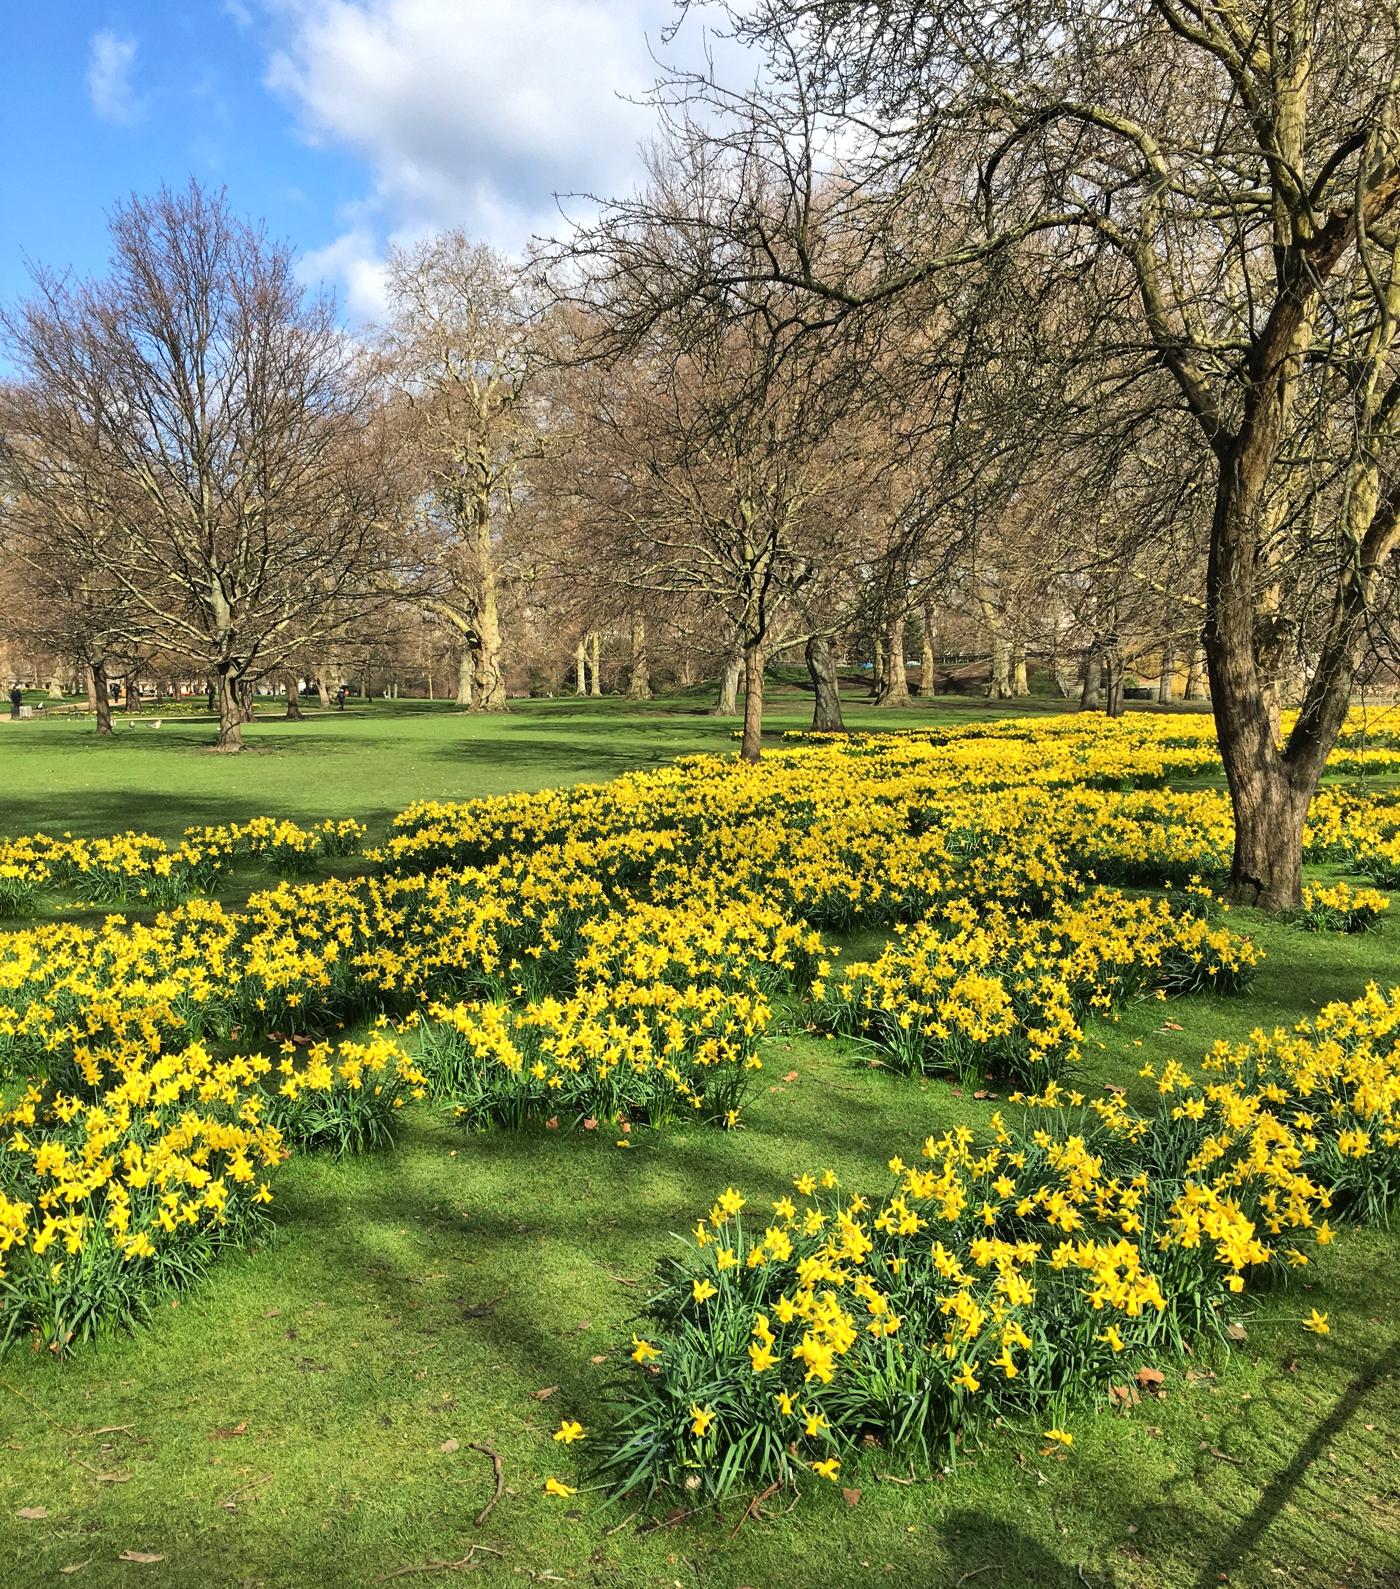 daffodils-st-james-park